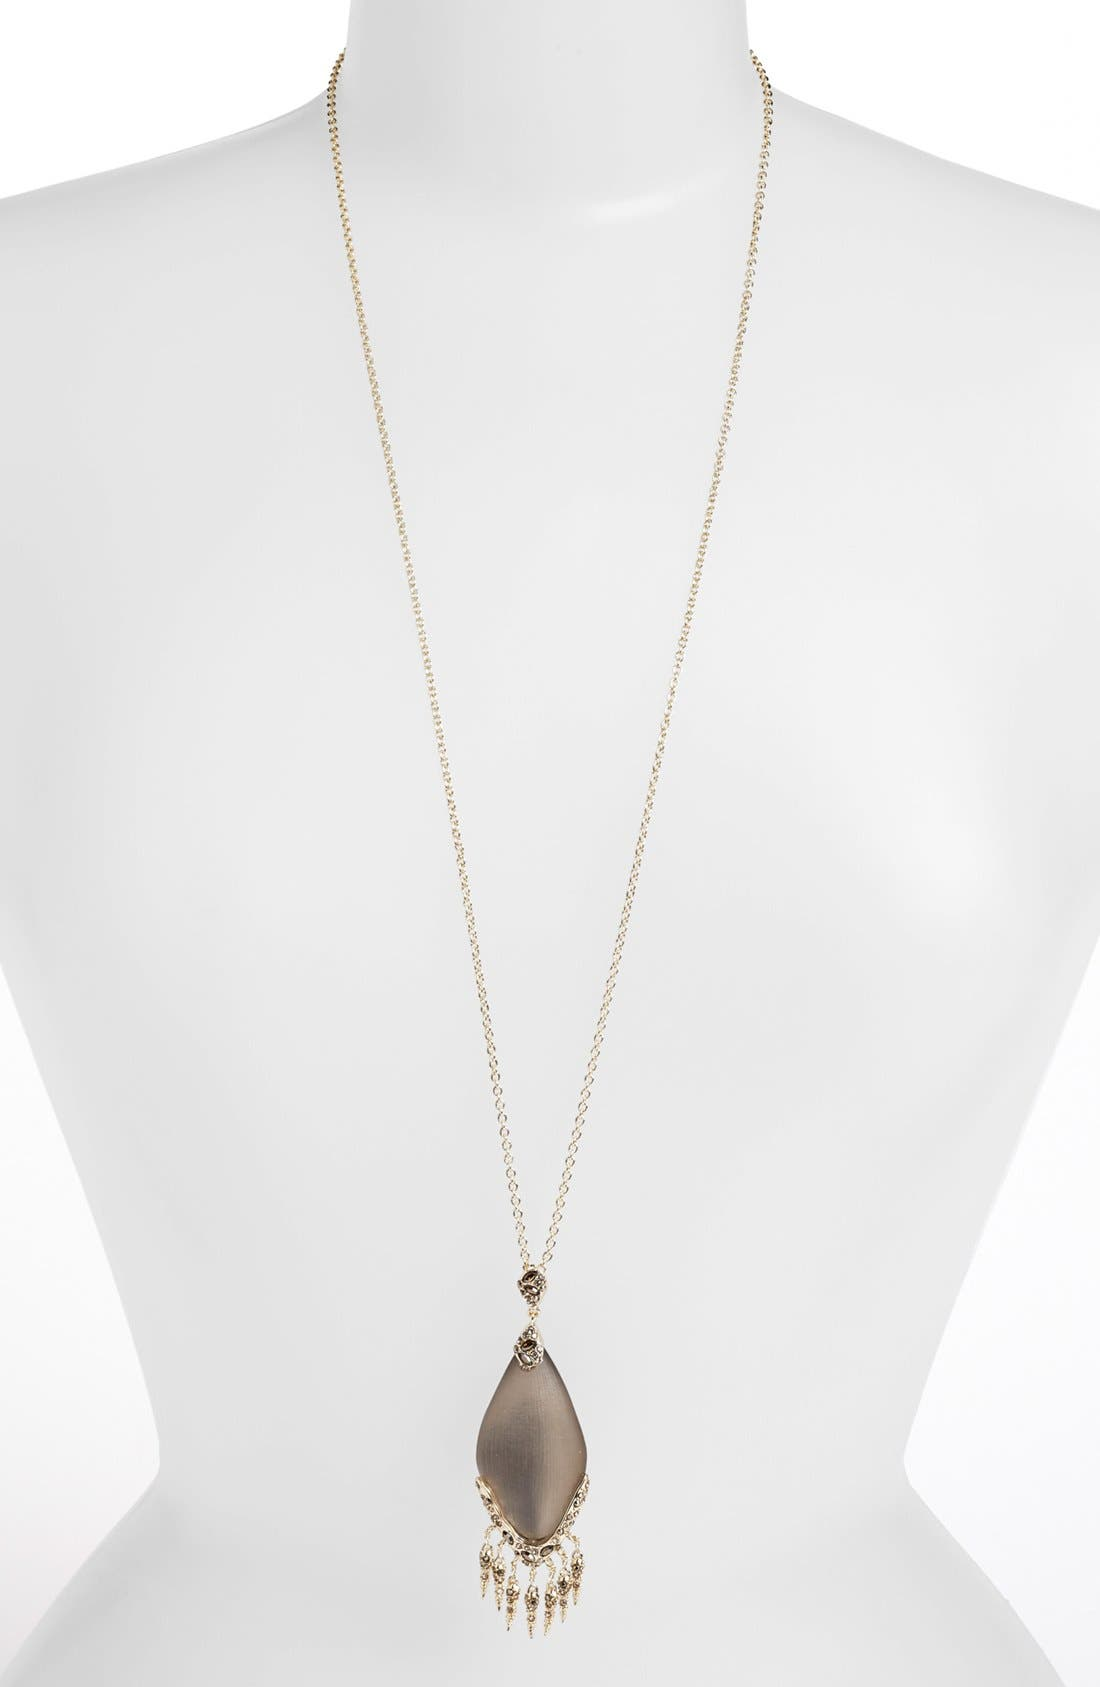 Main Image - Alexis Bittar 'Lucite® - Neo Bohemian' Long Fringe Pendant Necklace